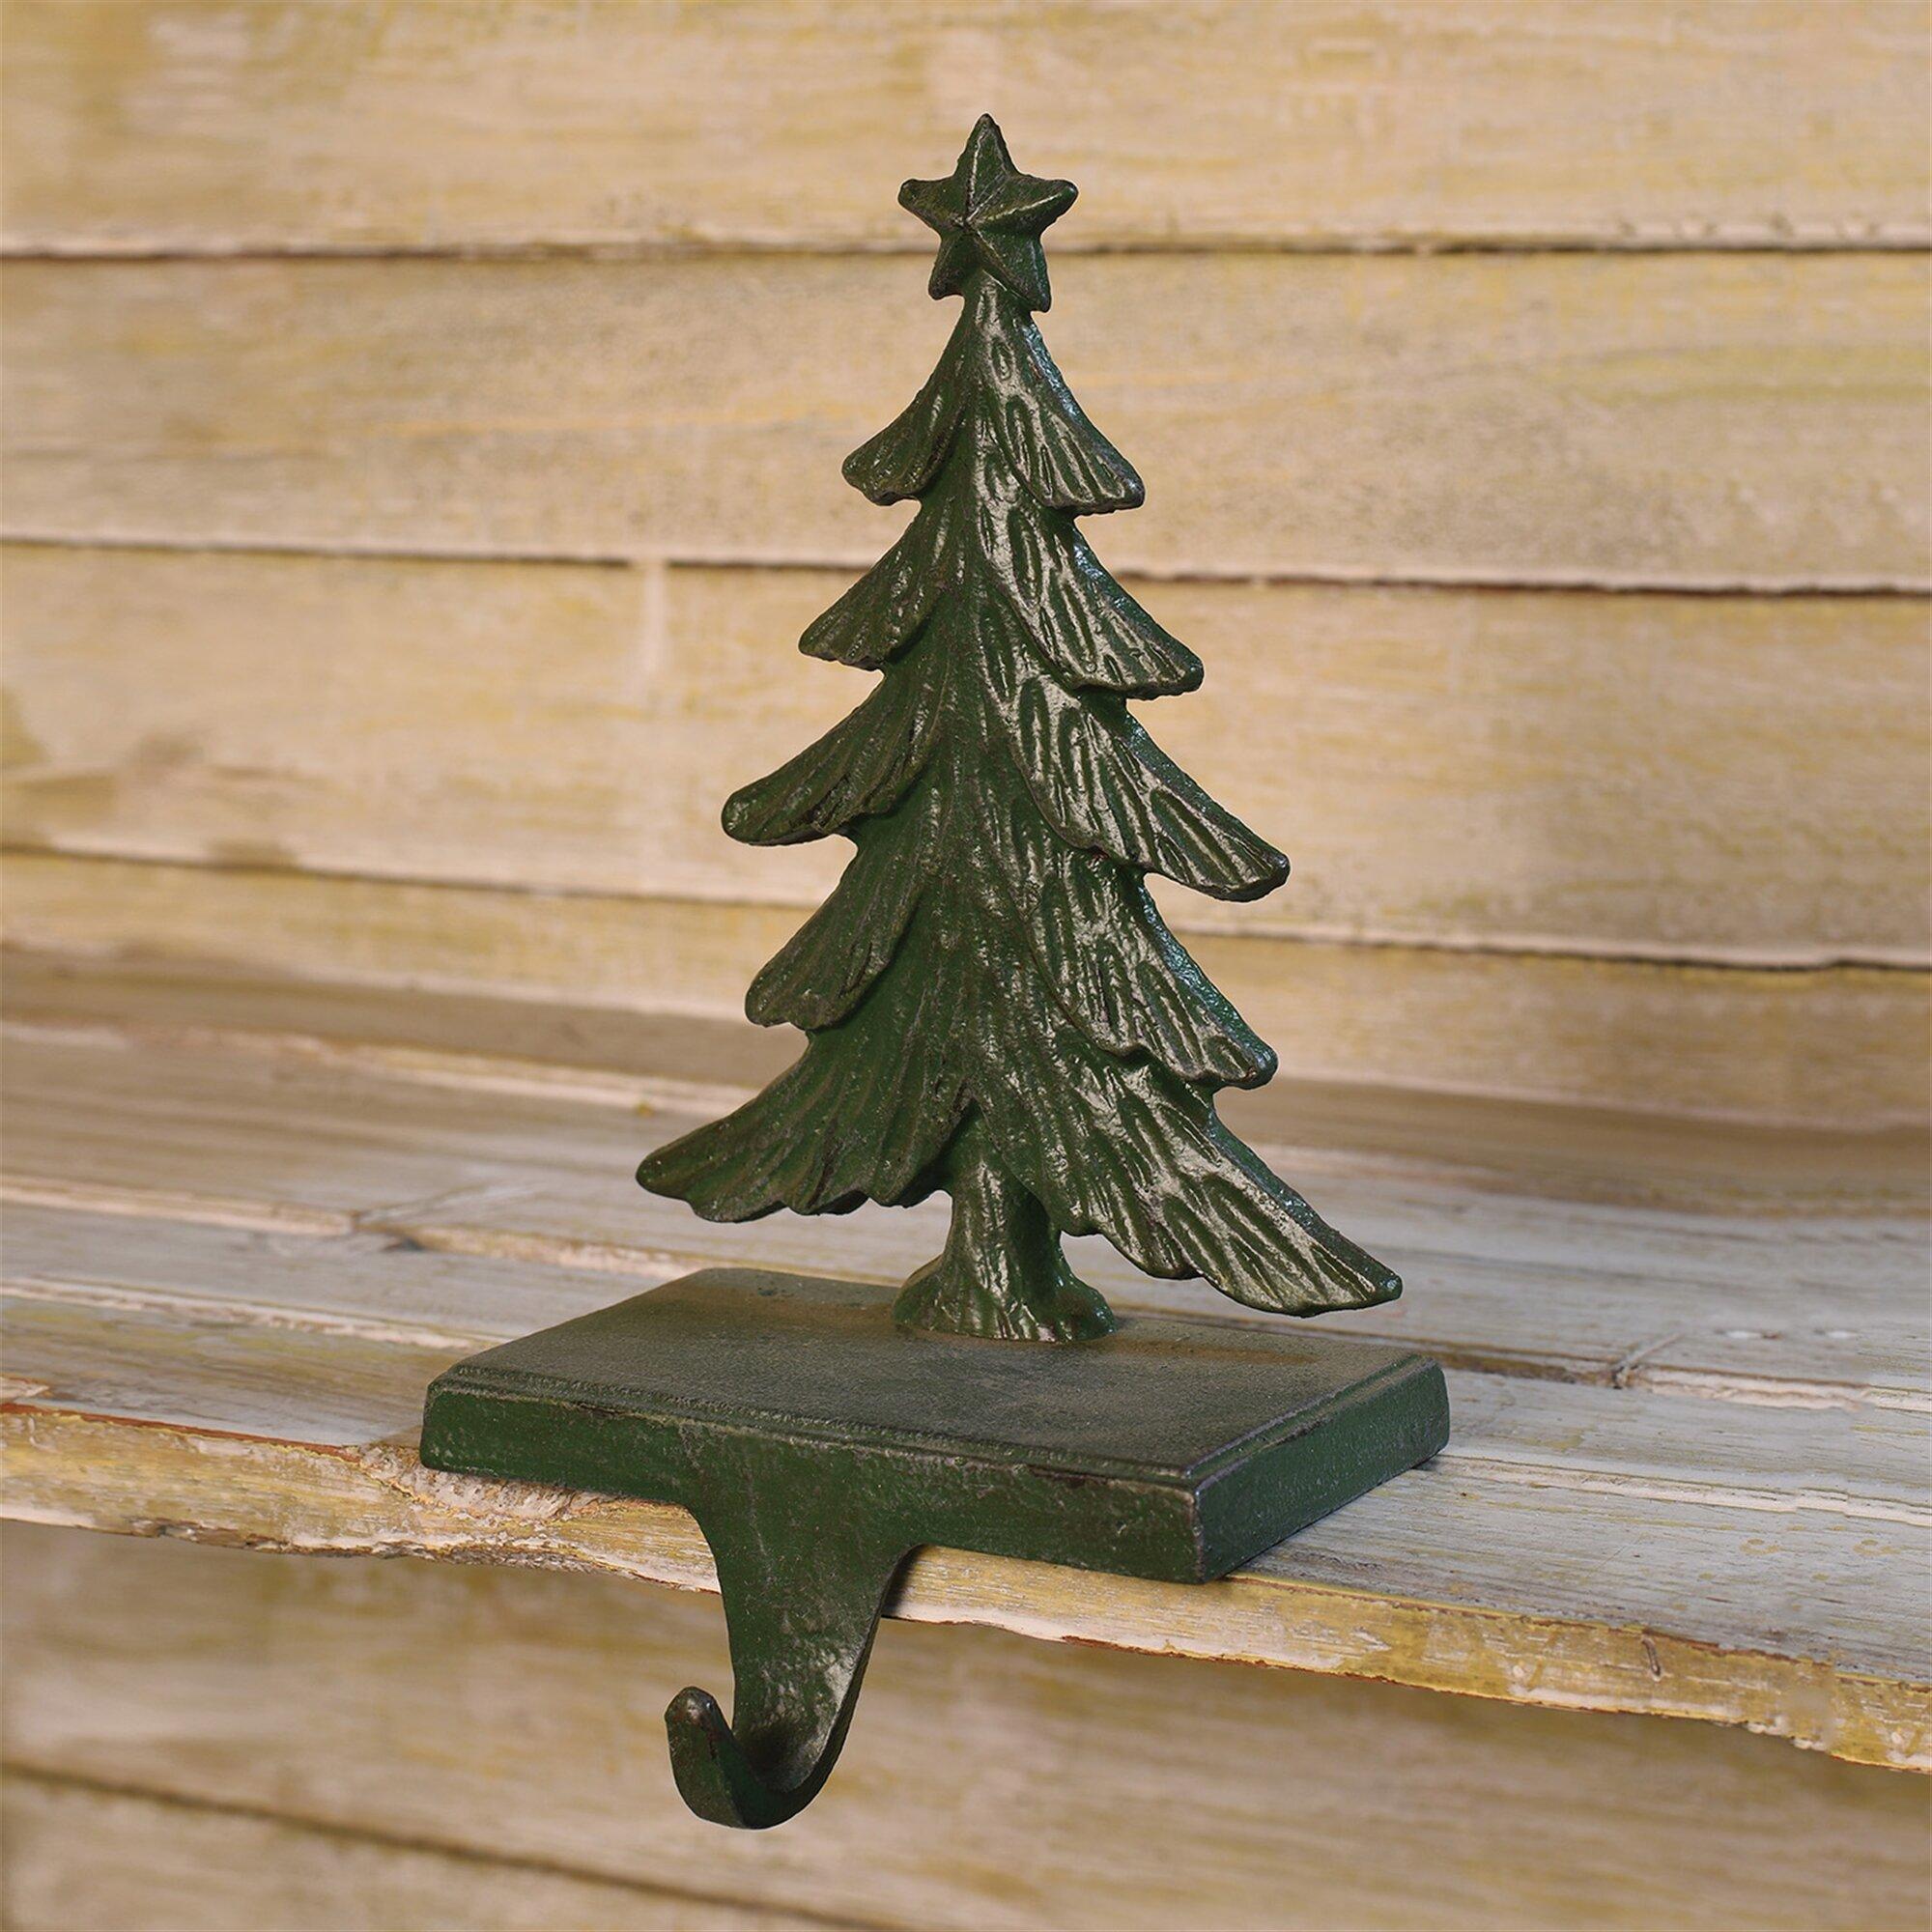 Christmas Tree Stocking Holder.Christmas Tree Cast Iron Stocking Holder